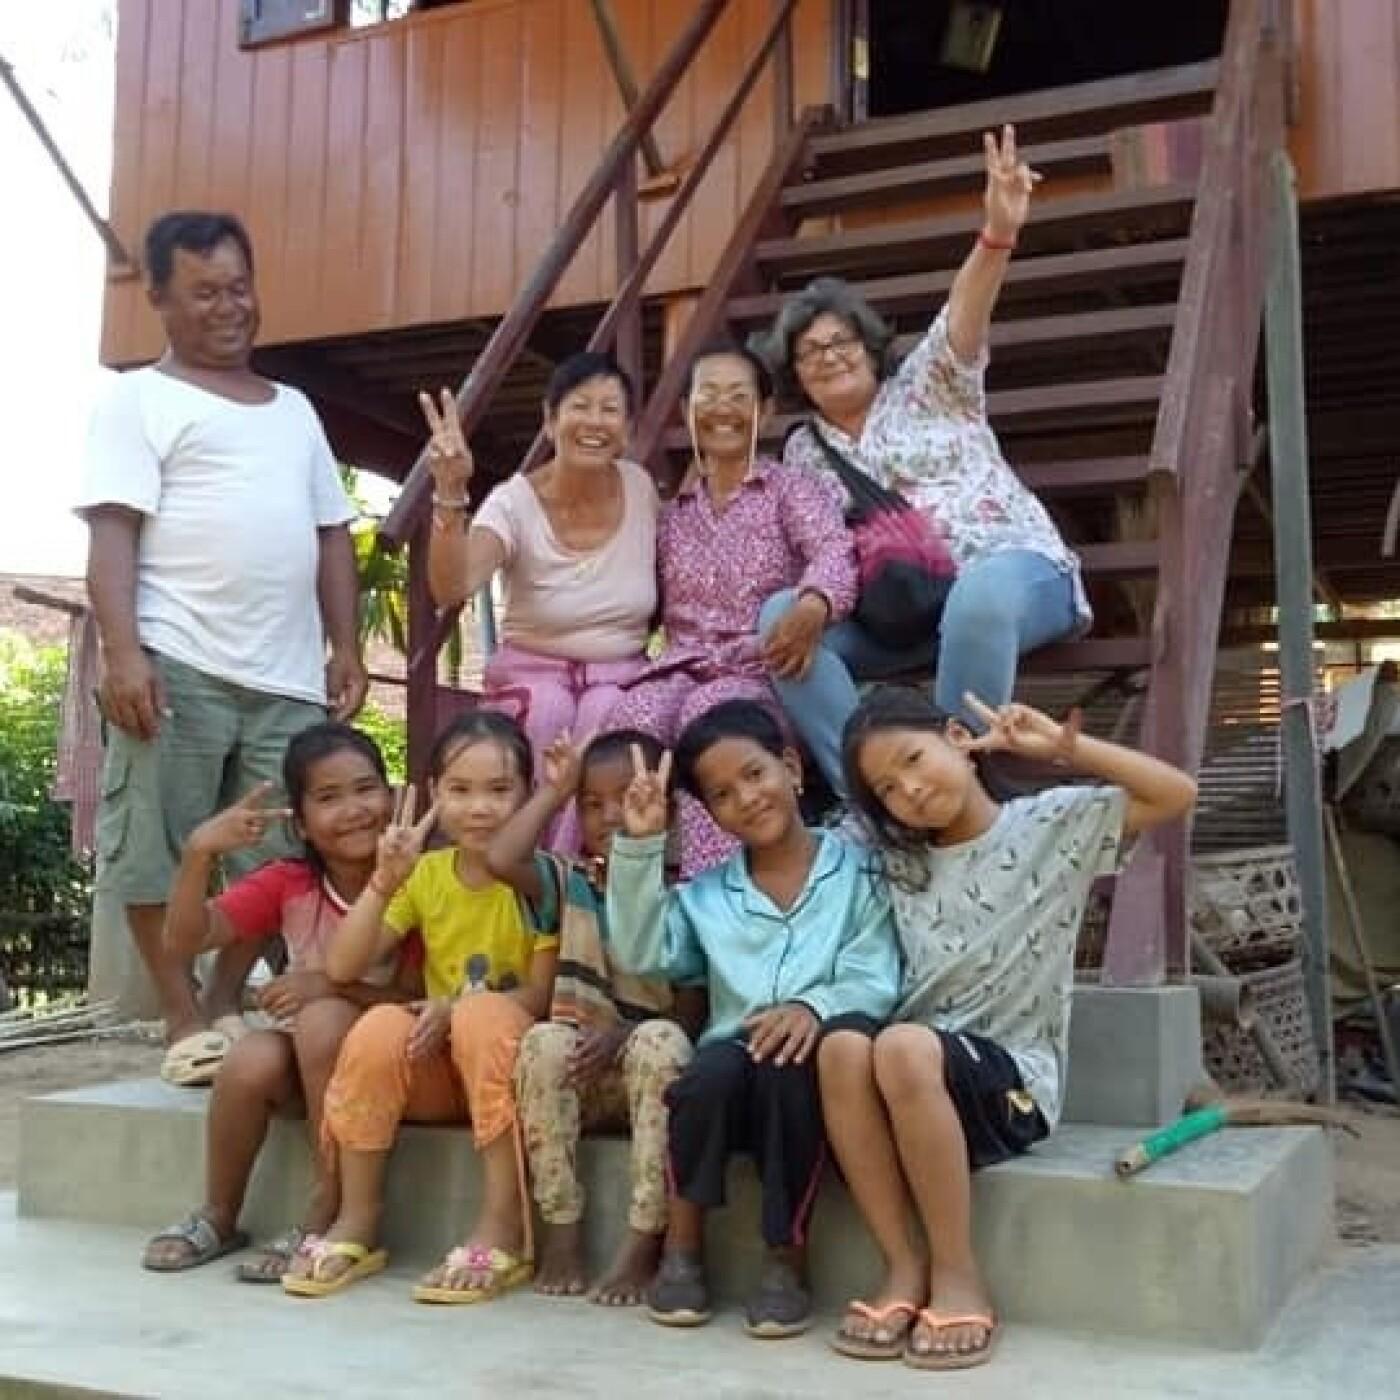 Laurence est expat au Cambodge depuis 7 ans - 16 04 2021 - StereoChic Radio